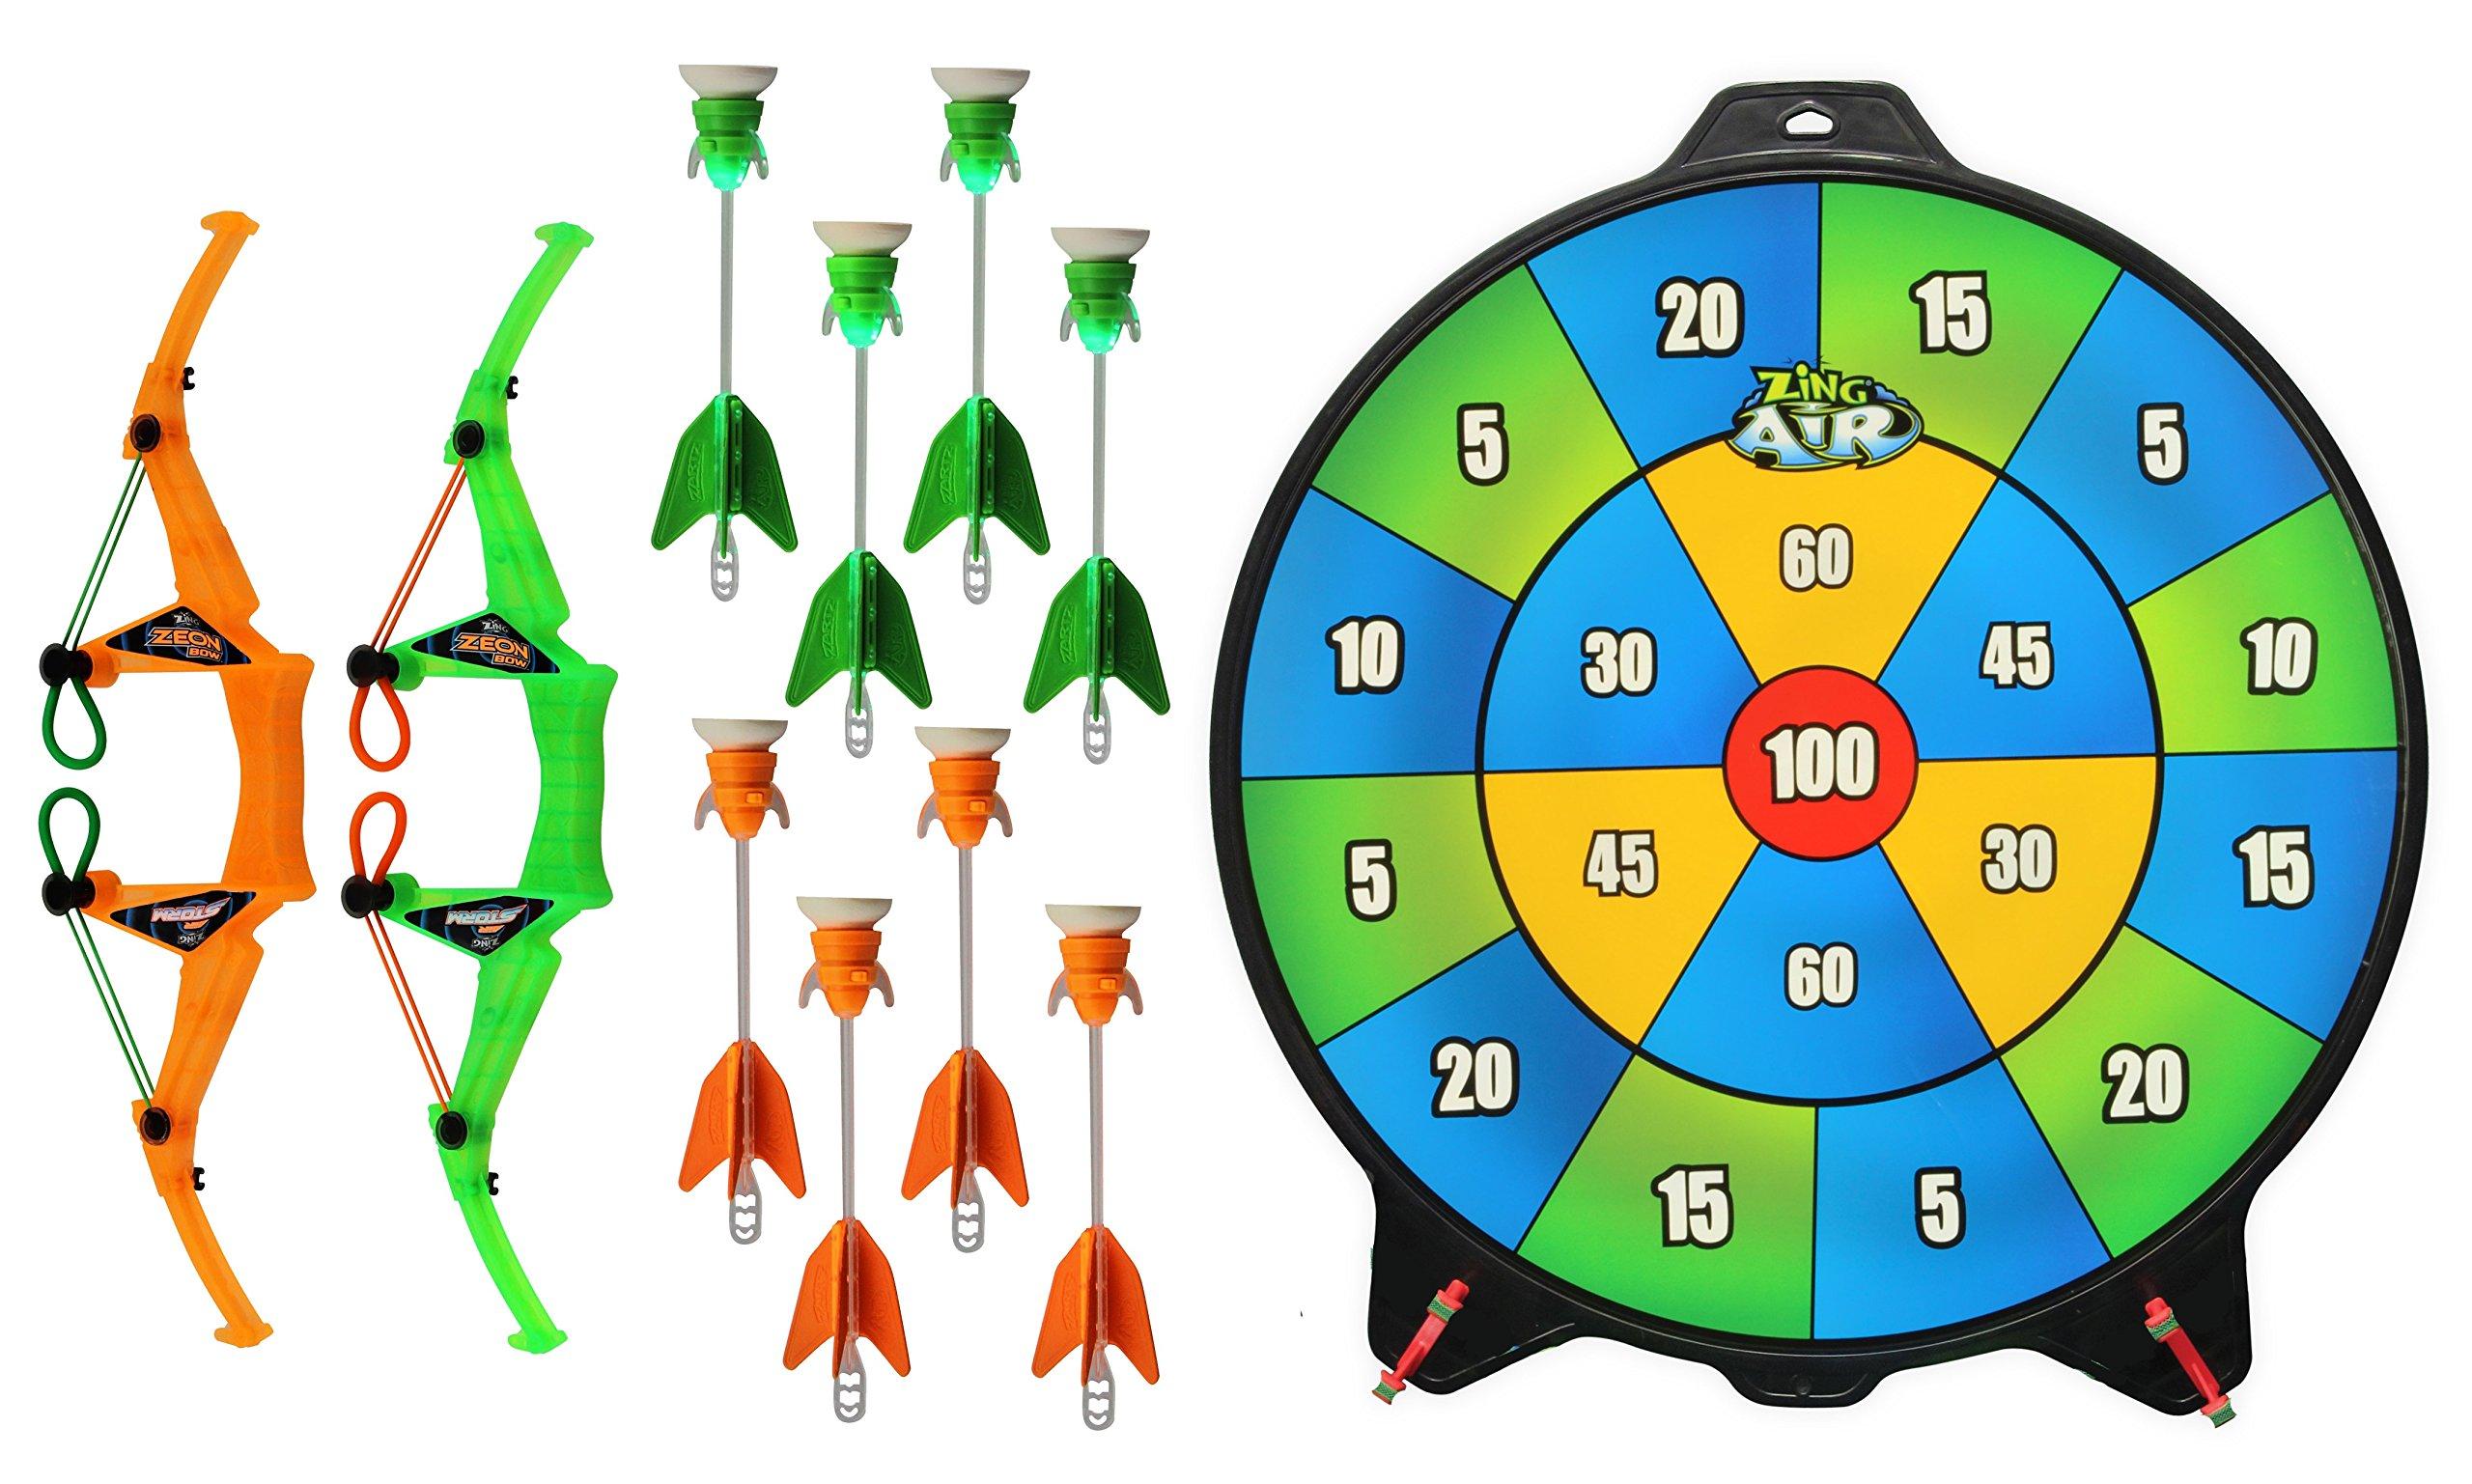 Zing Zeon Target Pack by Zing